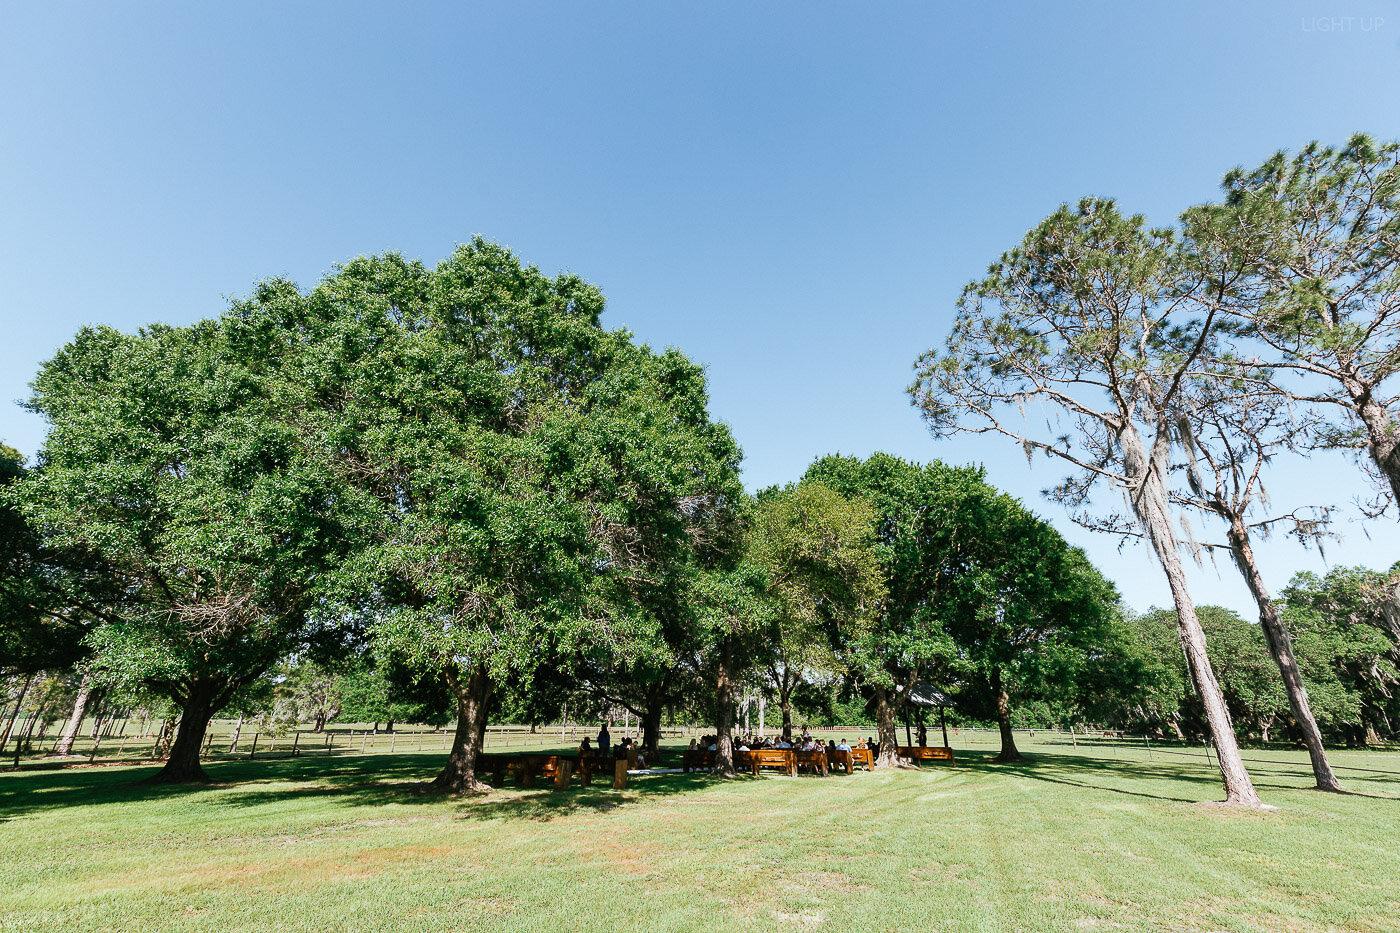 Lakeland-barn-wedding-at-white-horse-ranch-31.jpg